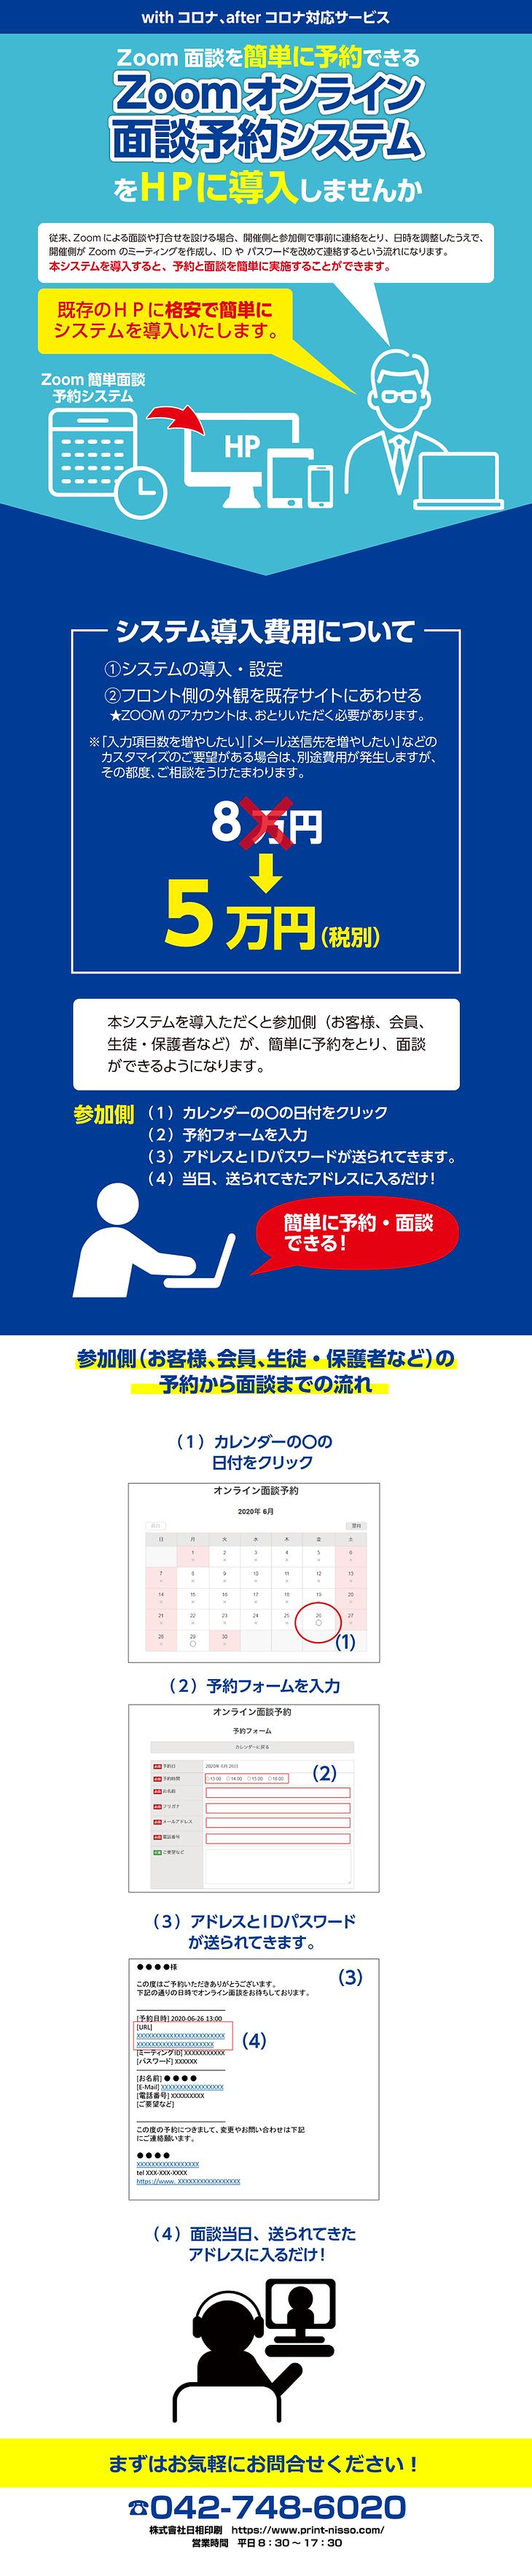 【CS6】-Zoom(2020.7.9).png